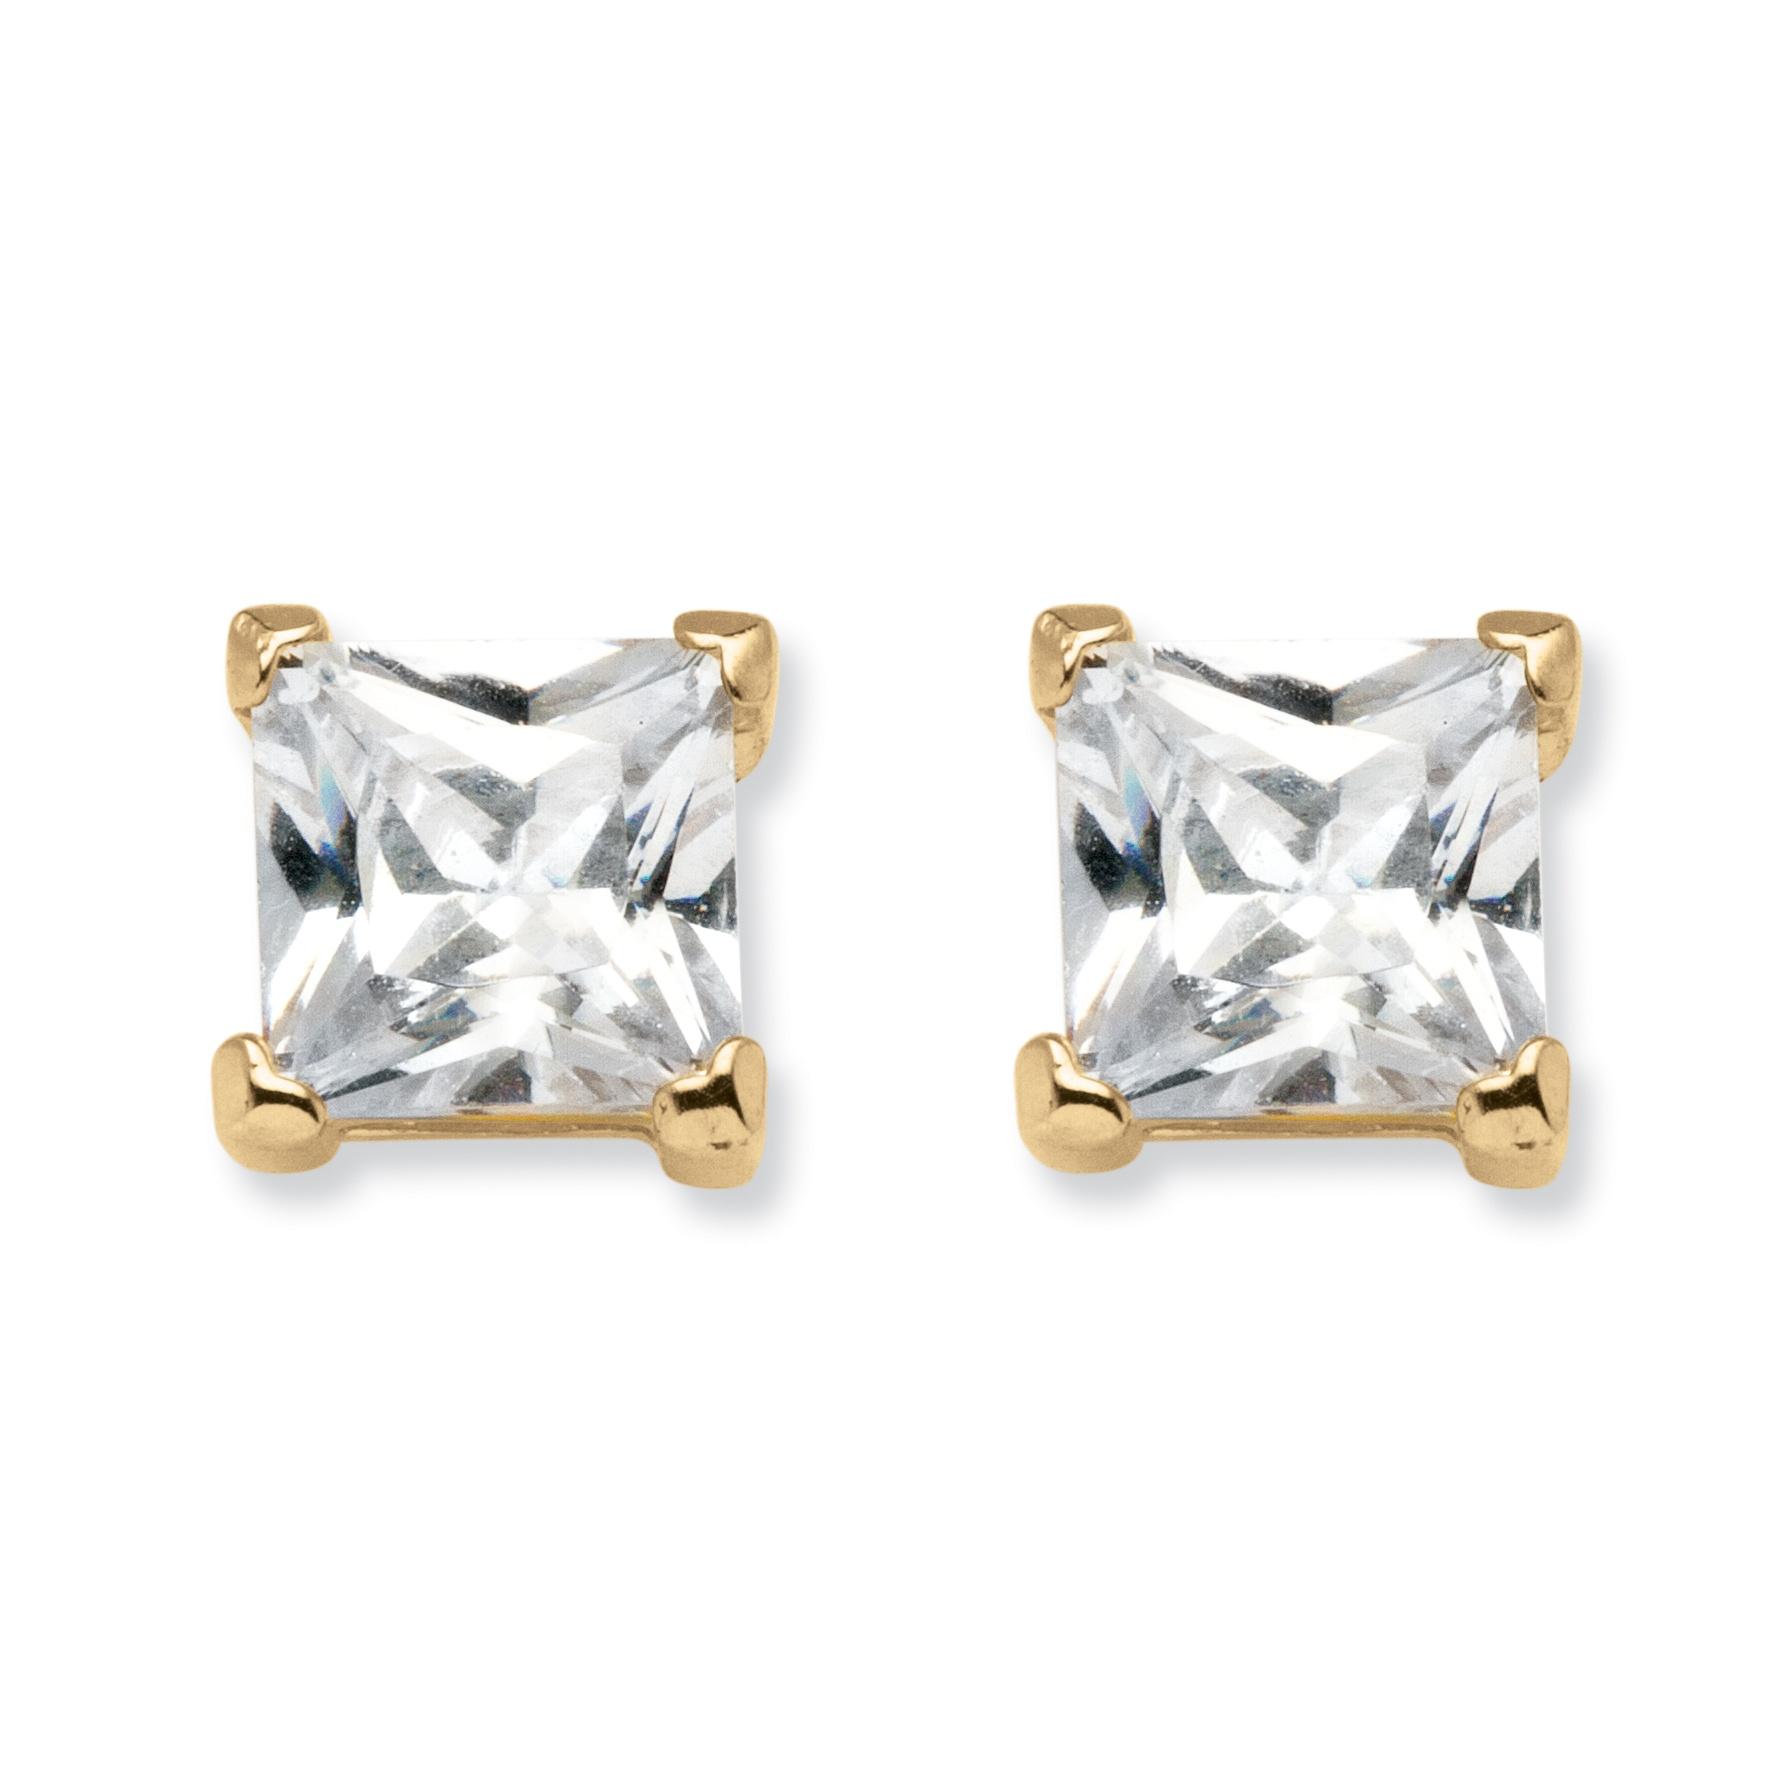 4.24 TCW Princess-Cut Cubic Zirconia 18k Gold over Sterling Silver Stud Earrings